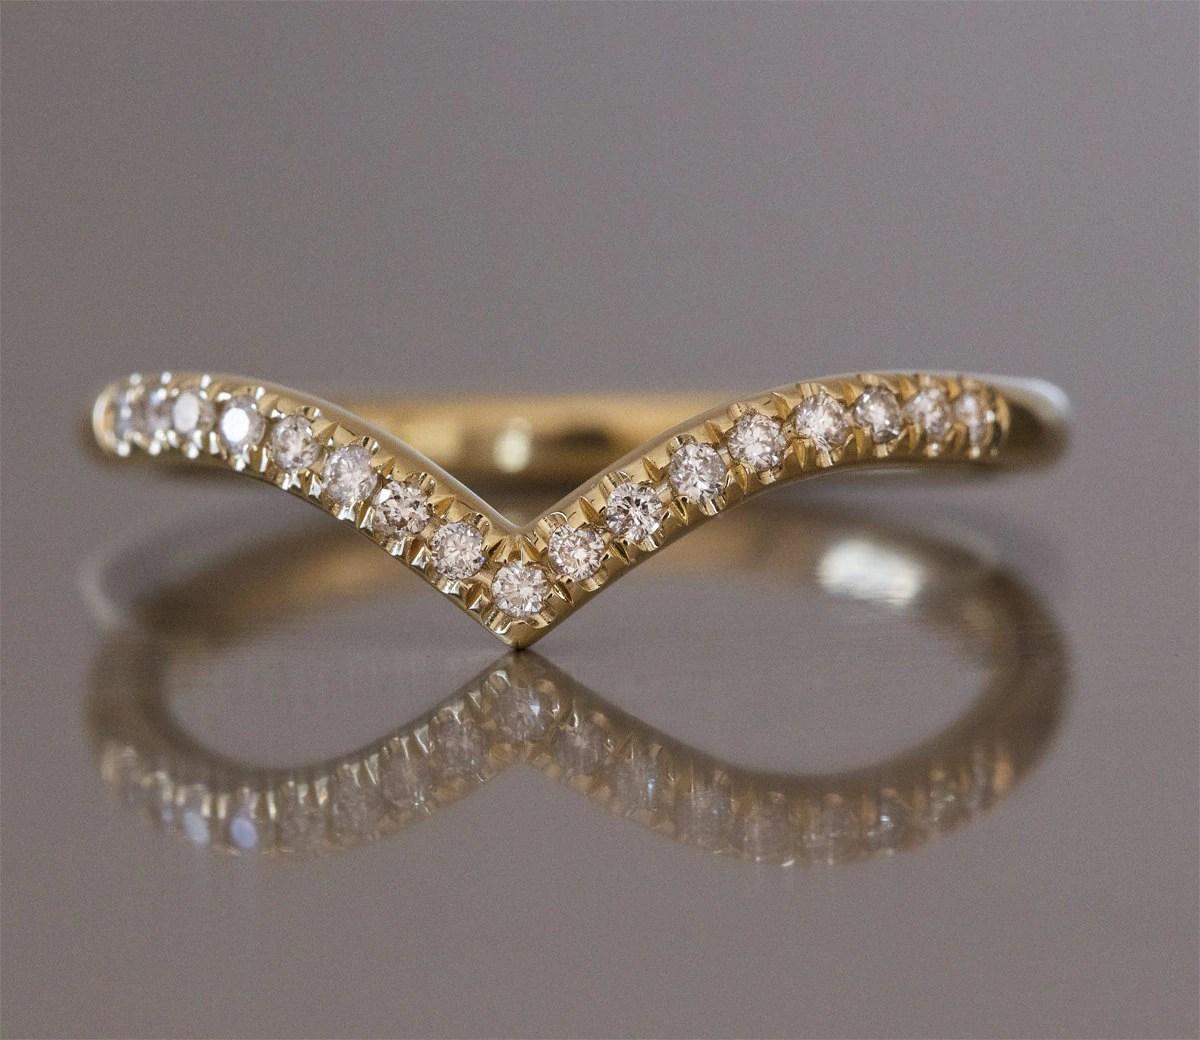 curved wedding band wedding band curved curved wedding band diamond v ring curved wedding ring chevron diamond ring elegant wedding ring thin diamond ring curved ring